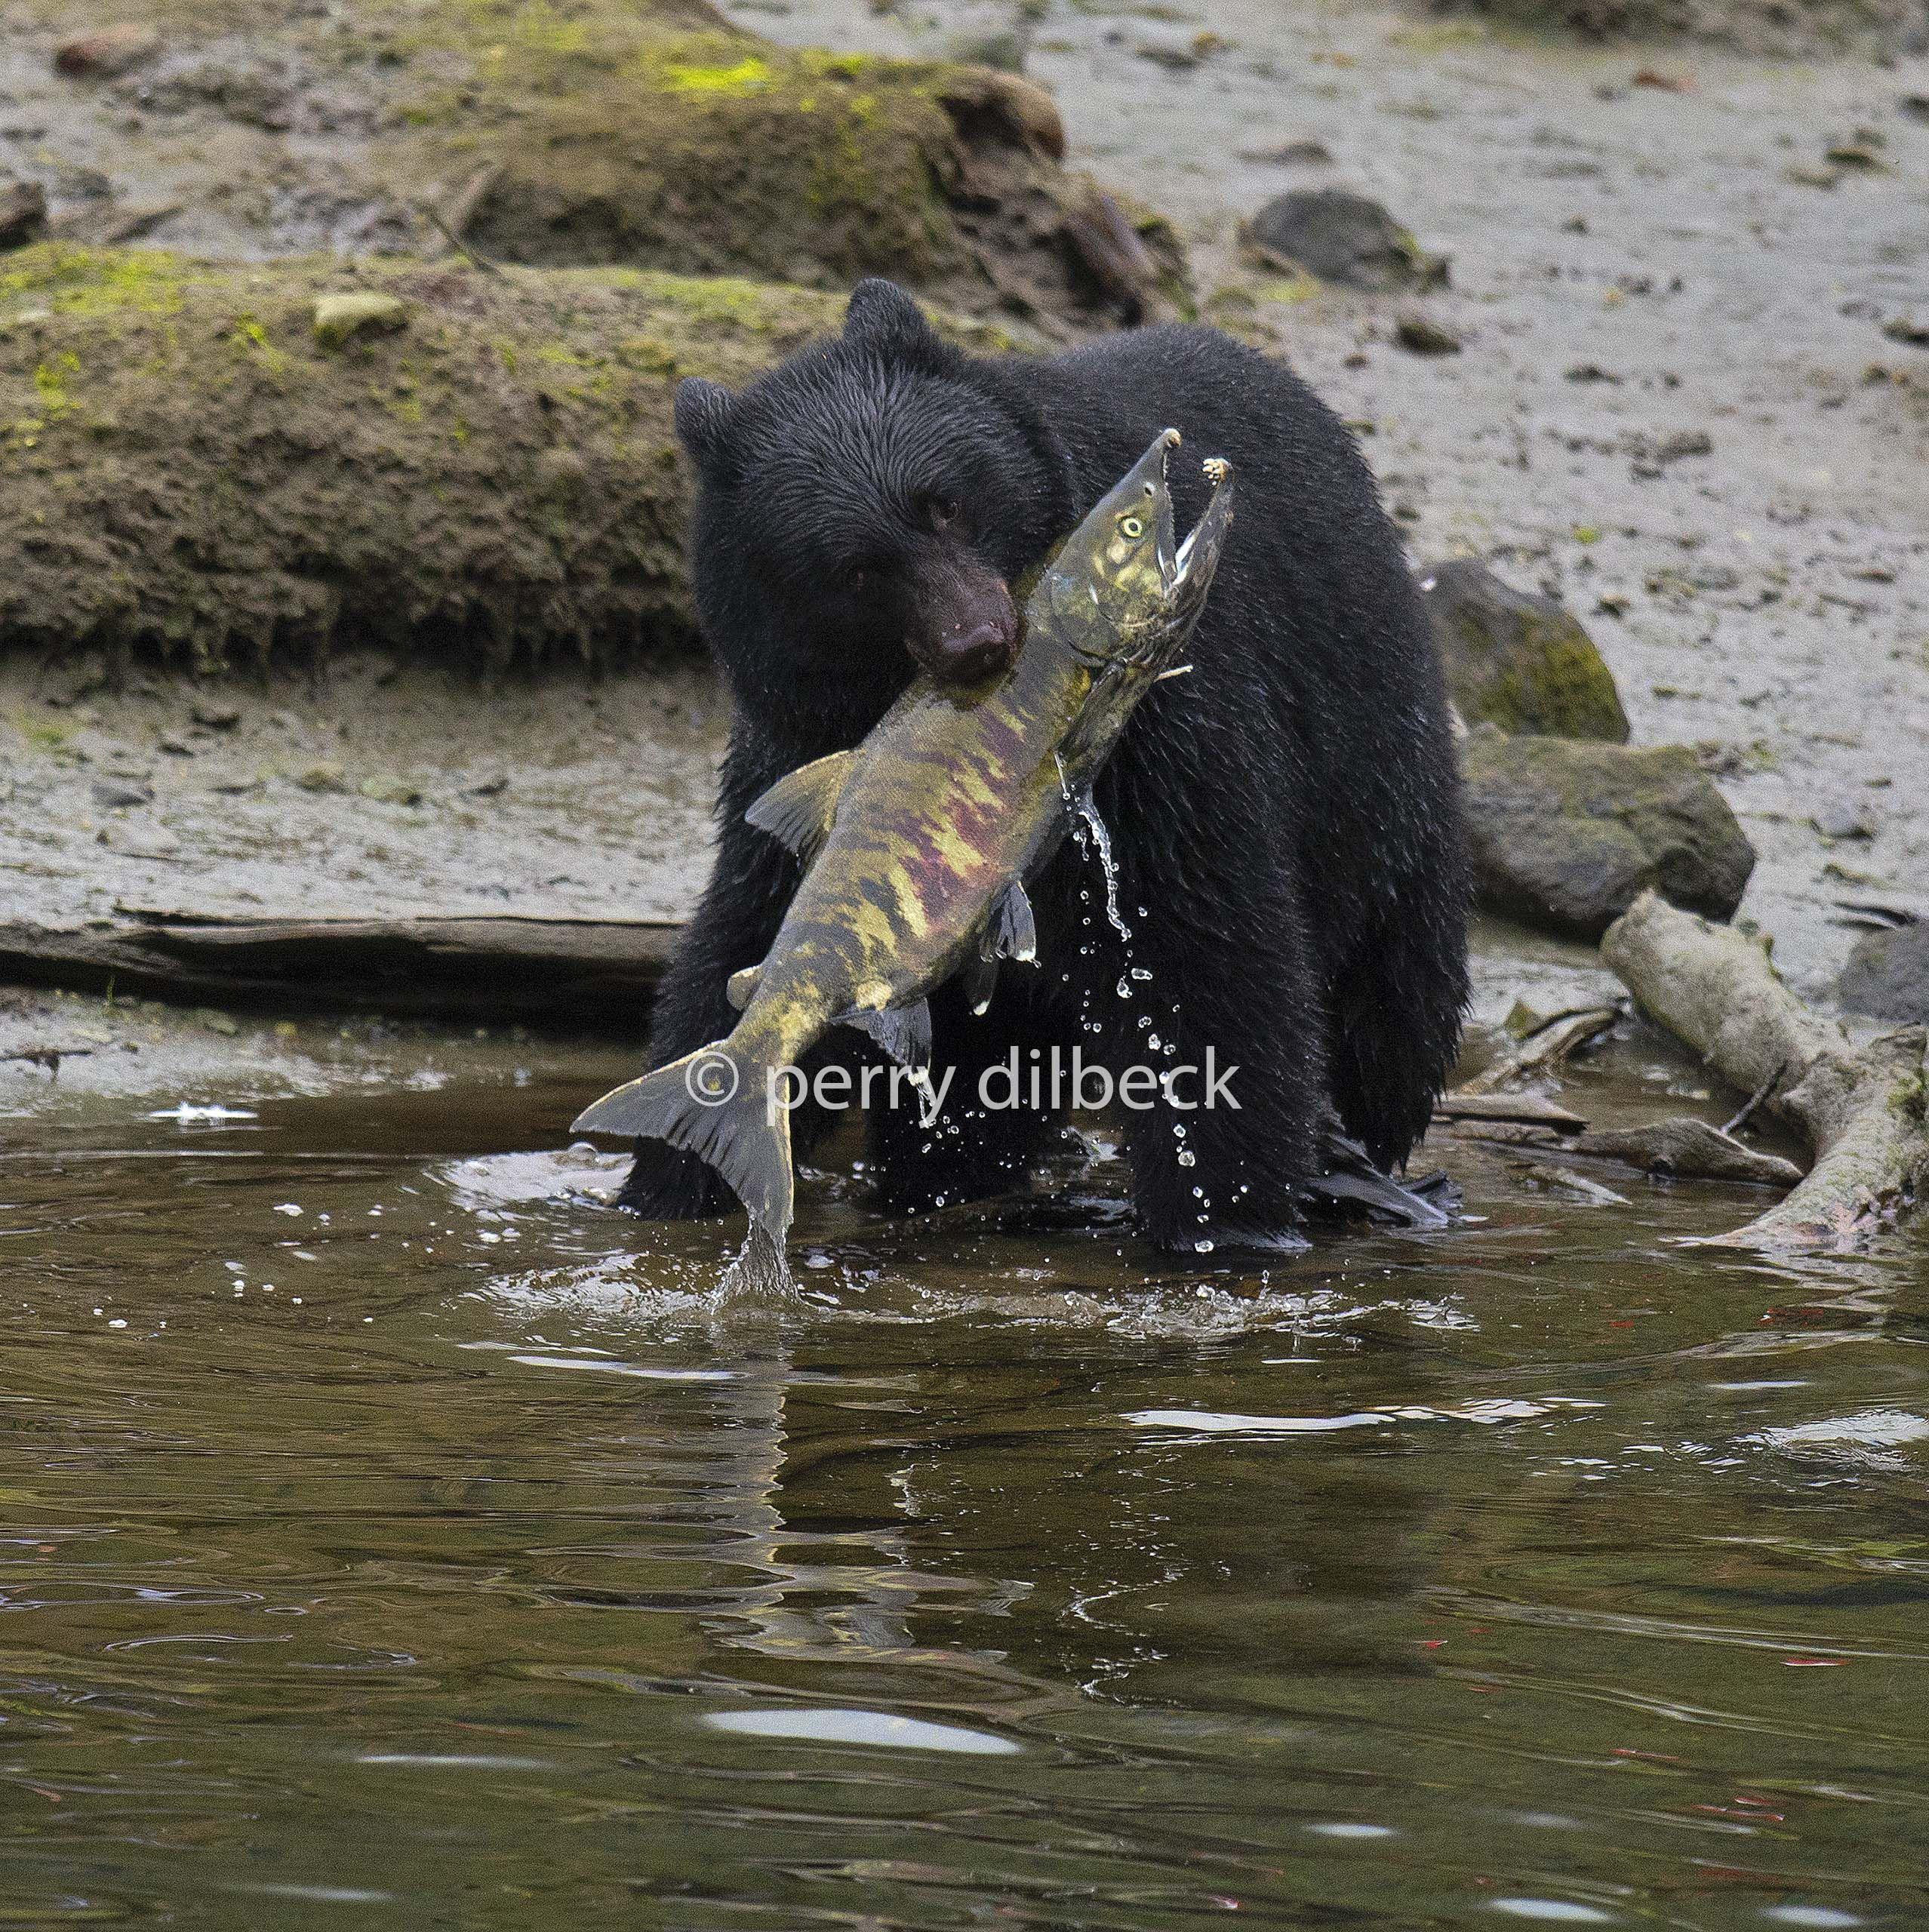 bearfishtopazandsharpen1.jpg